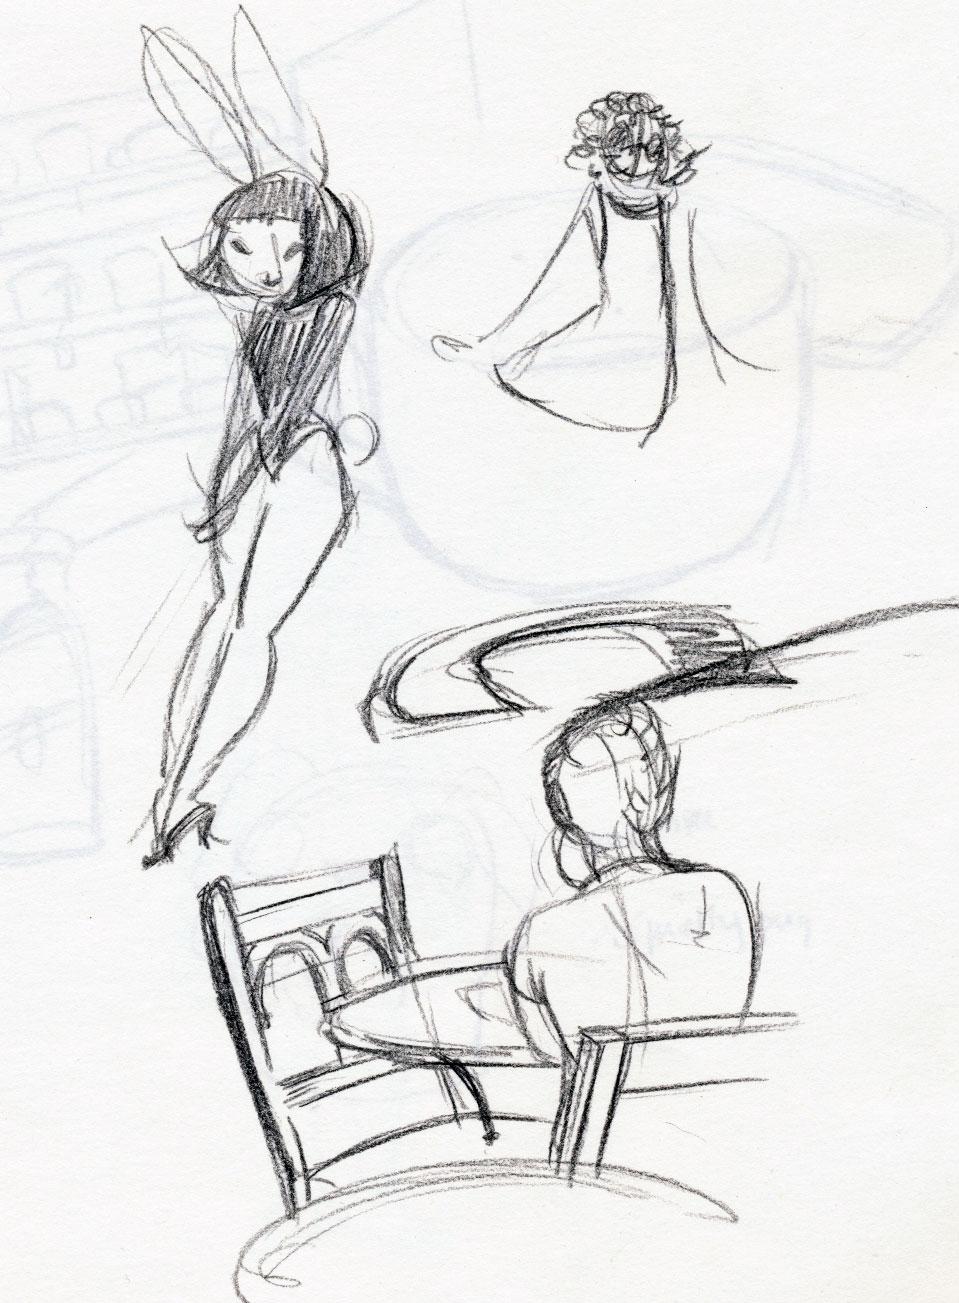 959x1303 Nattosoup Studio Art And Process Blog June 2013